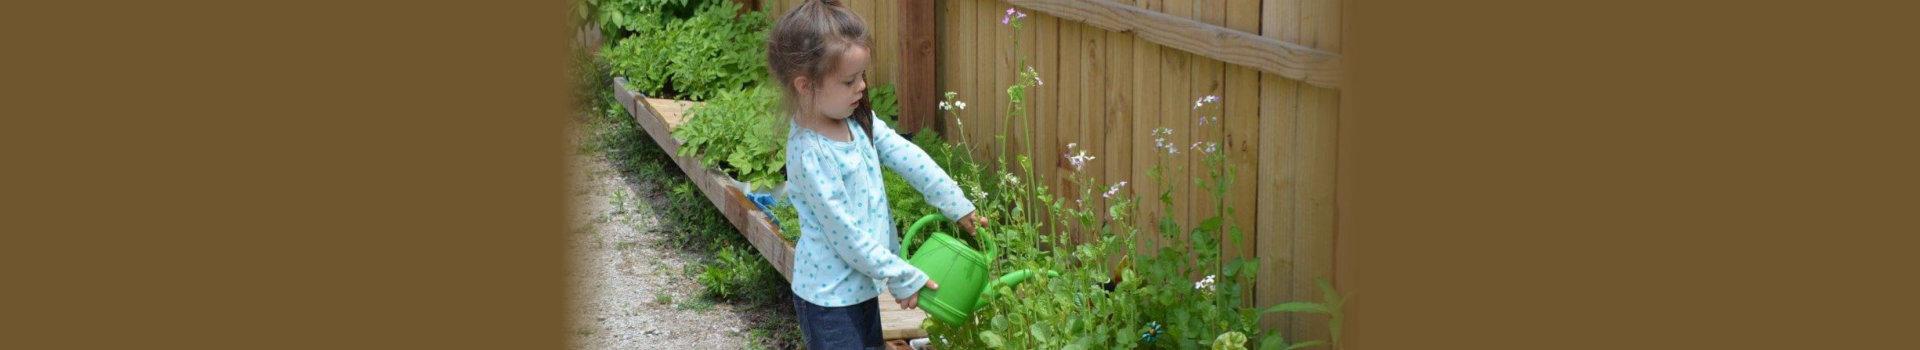 Toddler Girl watering plants in backyard